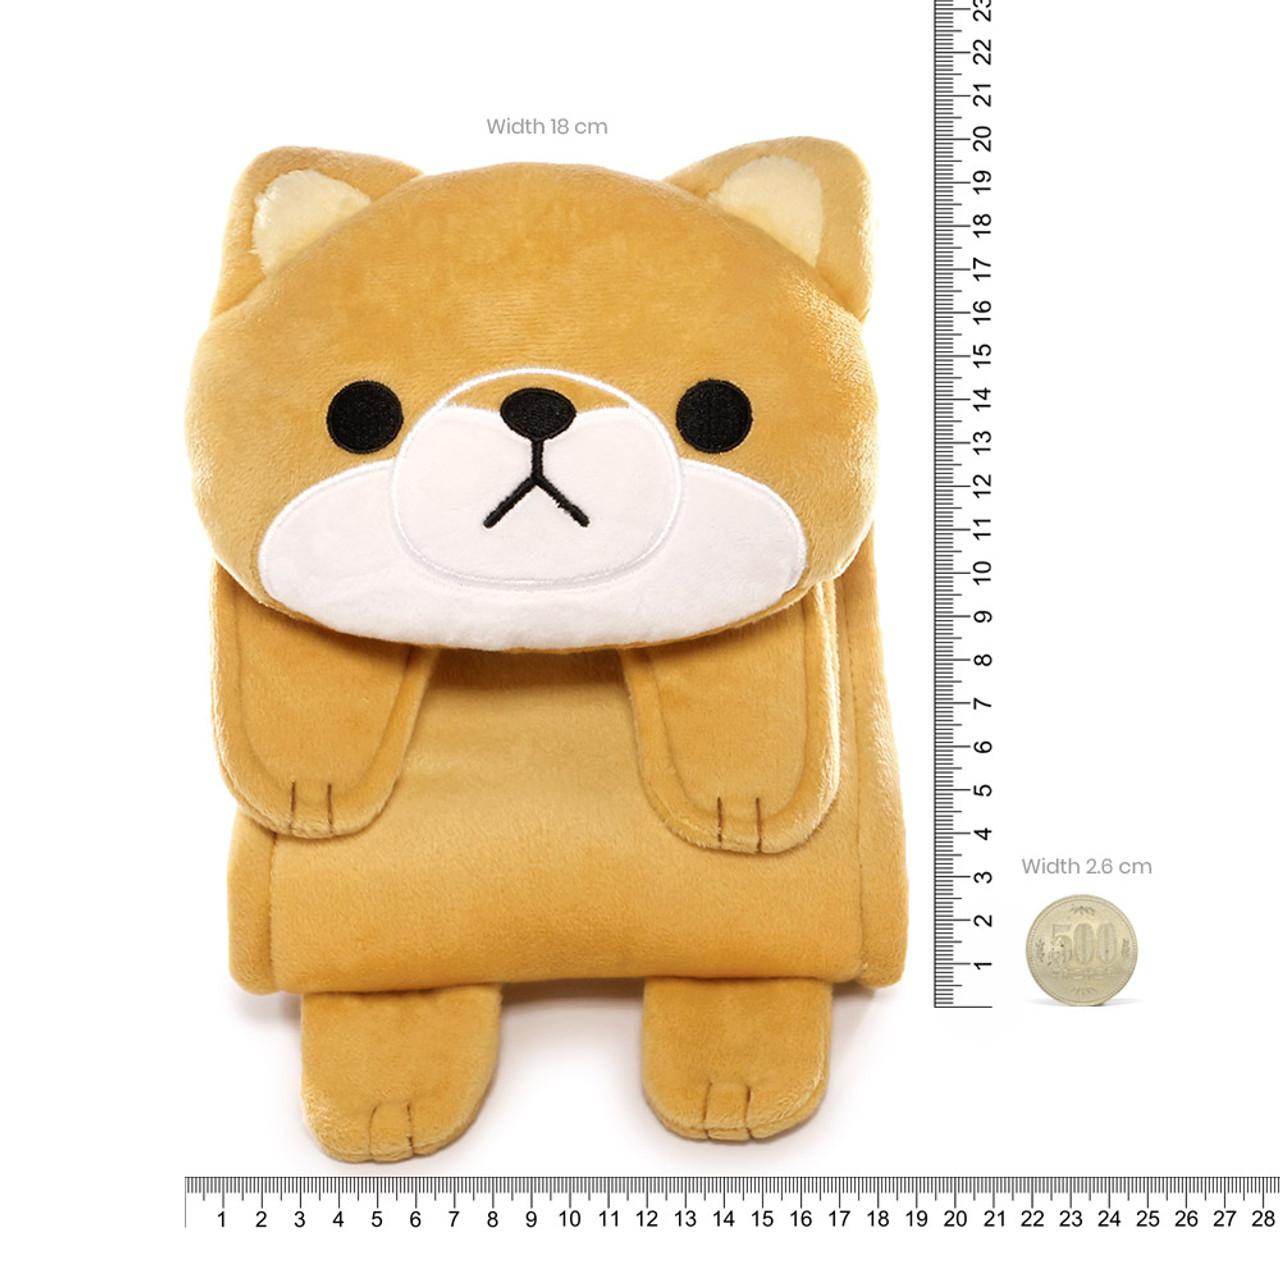 Meiho Shiba Inu Dog Toilet Roll Holder Plush Cover ( Proportion )